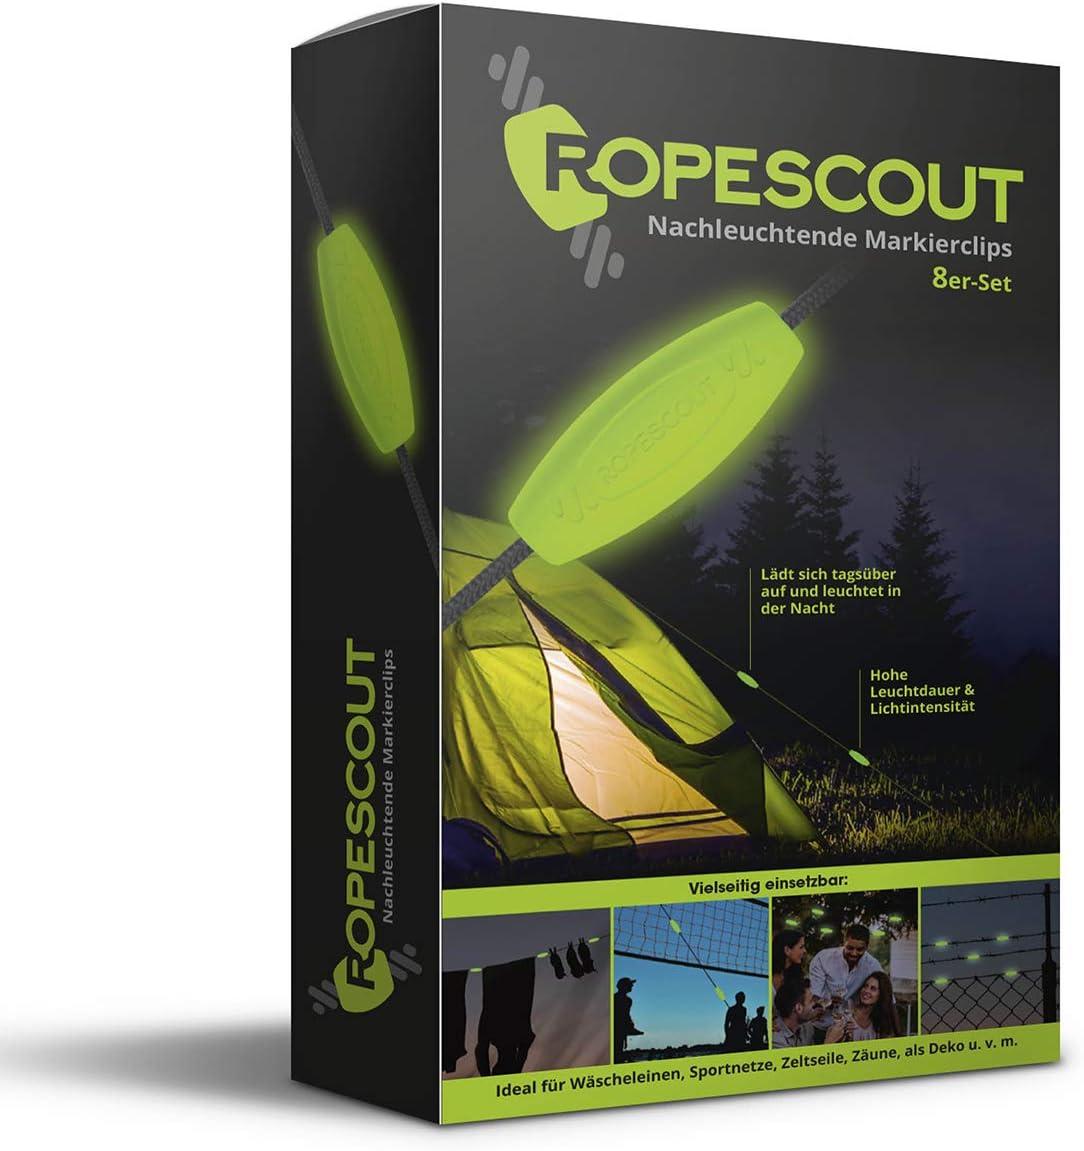 ROPESCOUT leuchtende Markierclips 48er Set F/ür Zeltspannseile | Made in Germany Volleyballnetze u.v.m hohe Leuchtkraft, lange Leuchtdauer